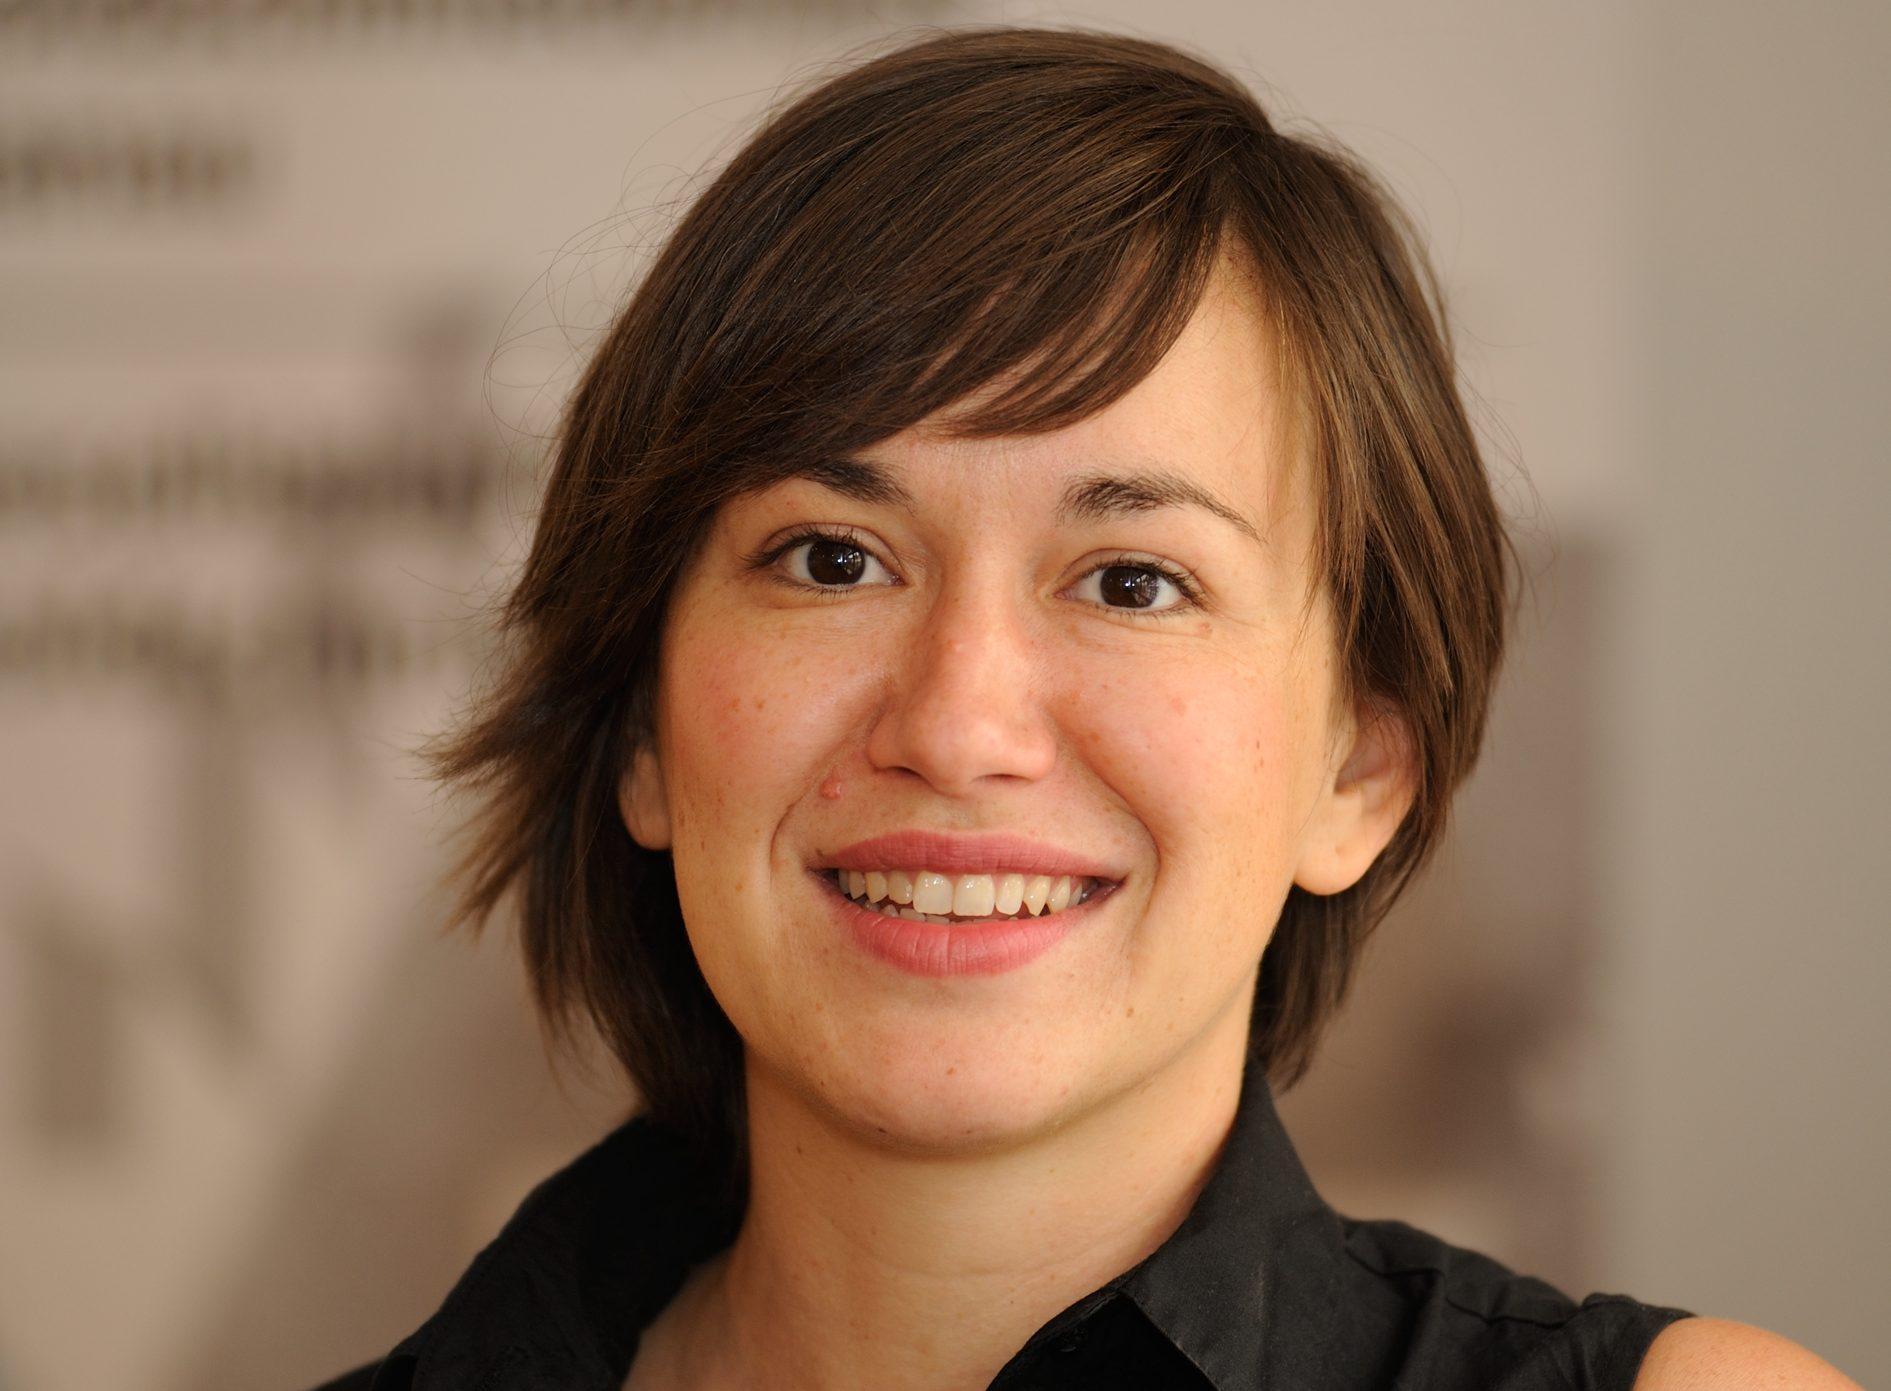 Tabea Reulecke. Foto met dank aan Deutsches Goldschmiedehaus, Medienzentrum Hanau-Bildarchiv©